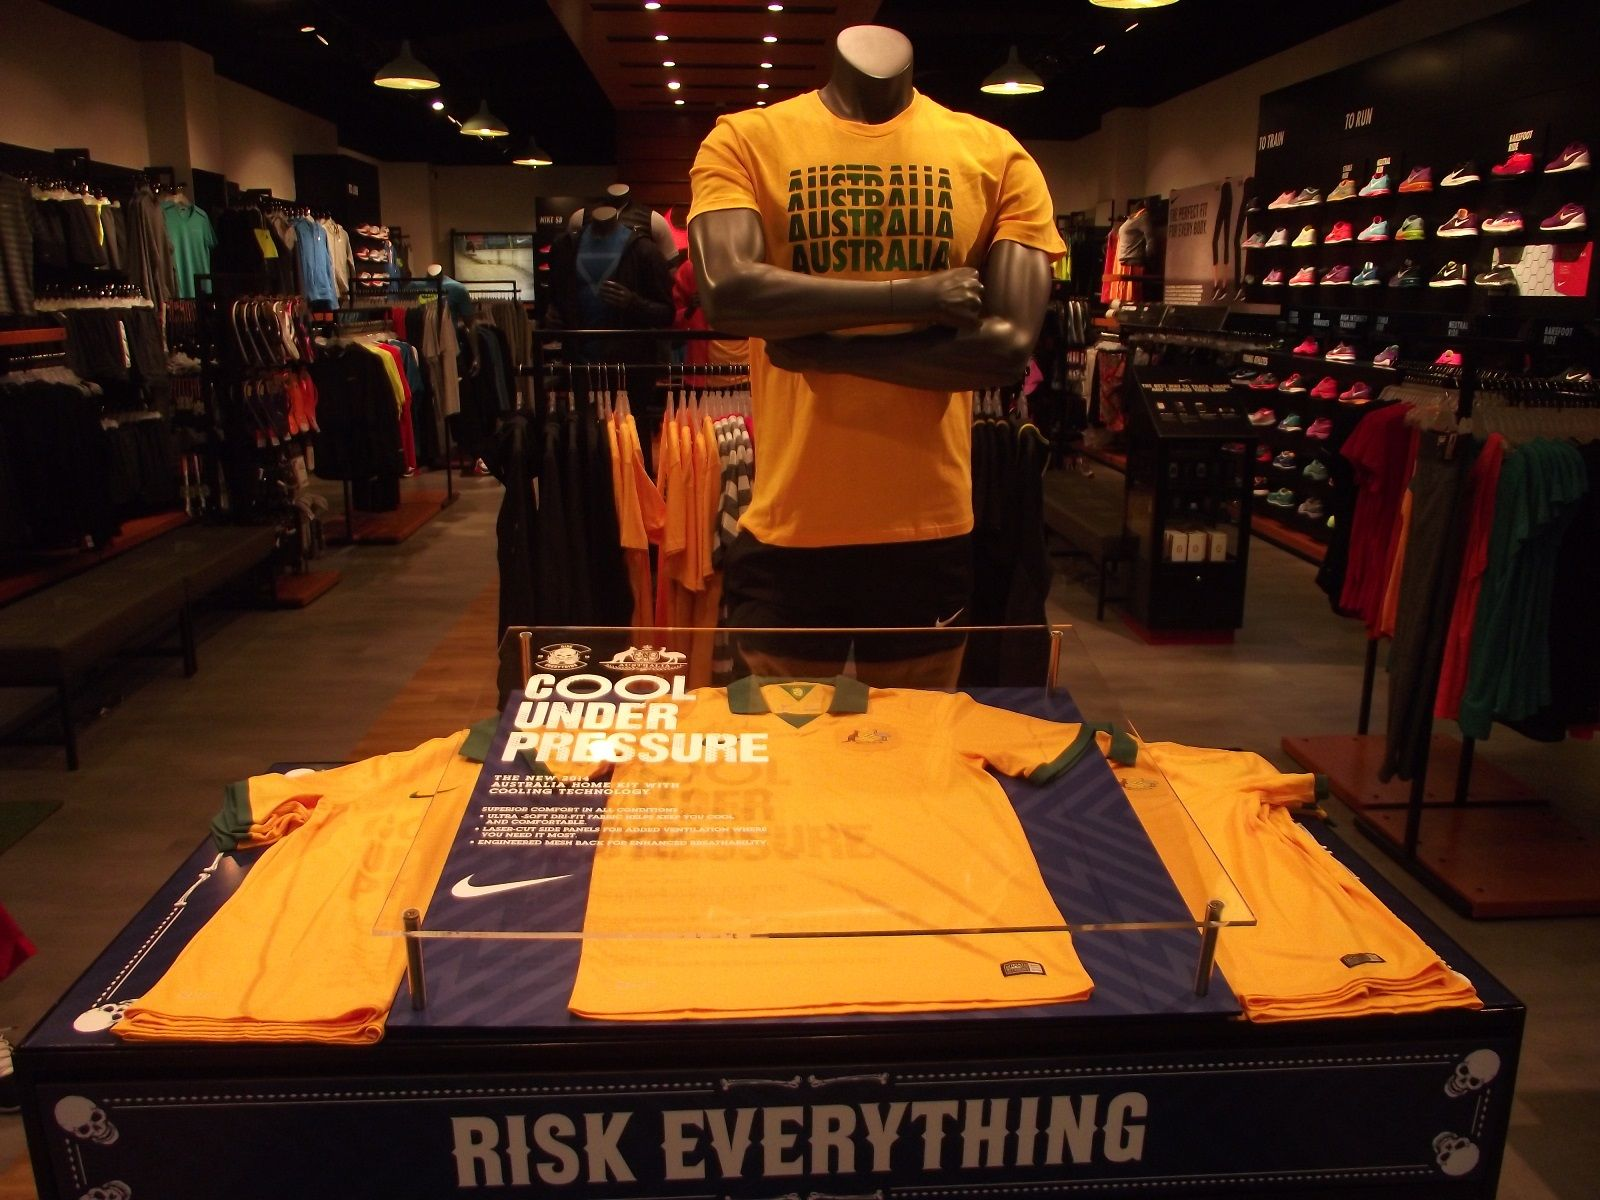 Nike Football retail table display display.